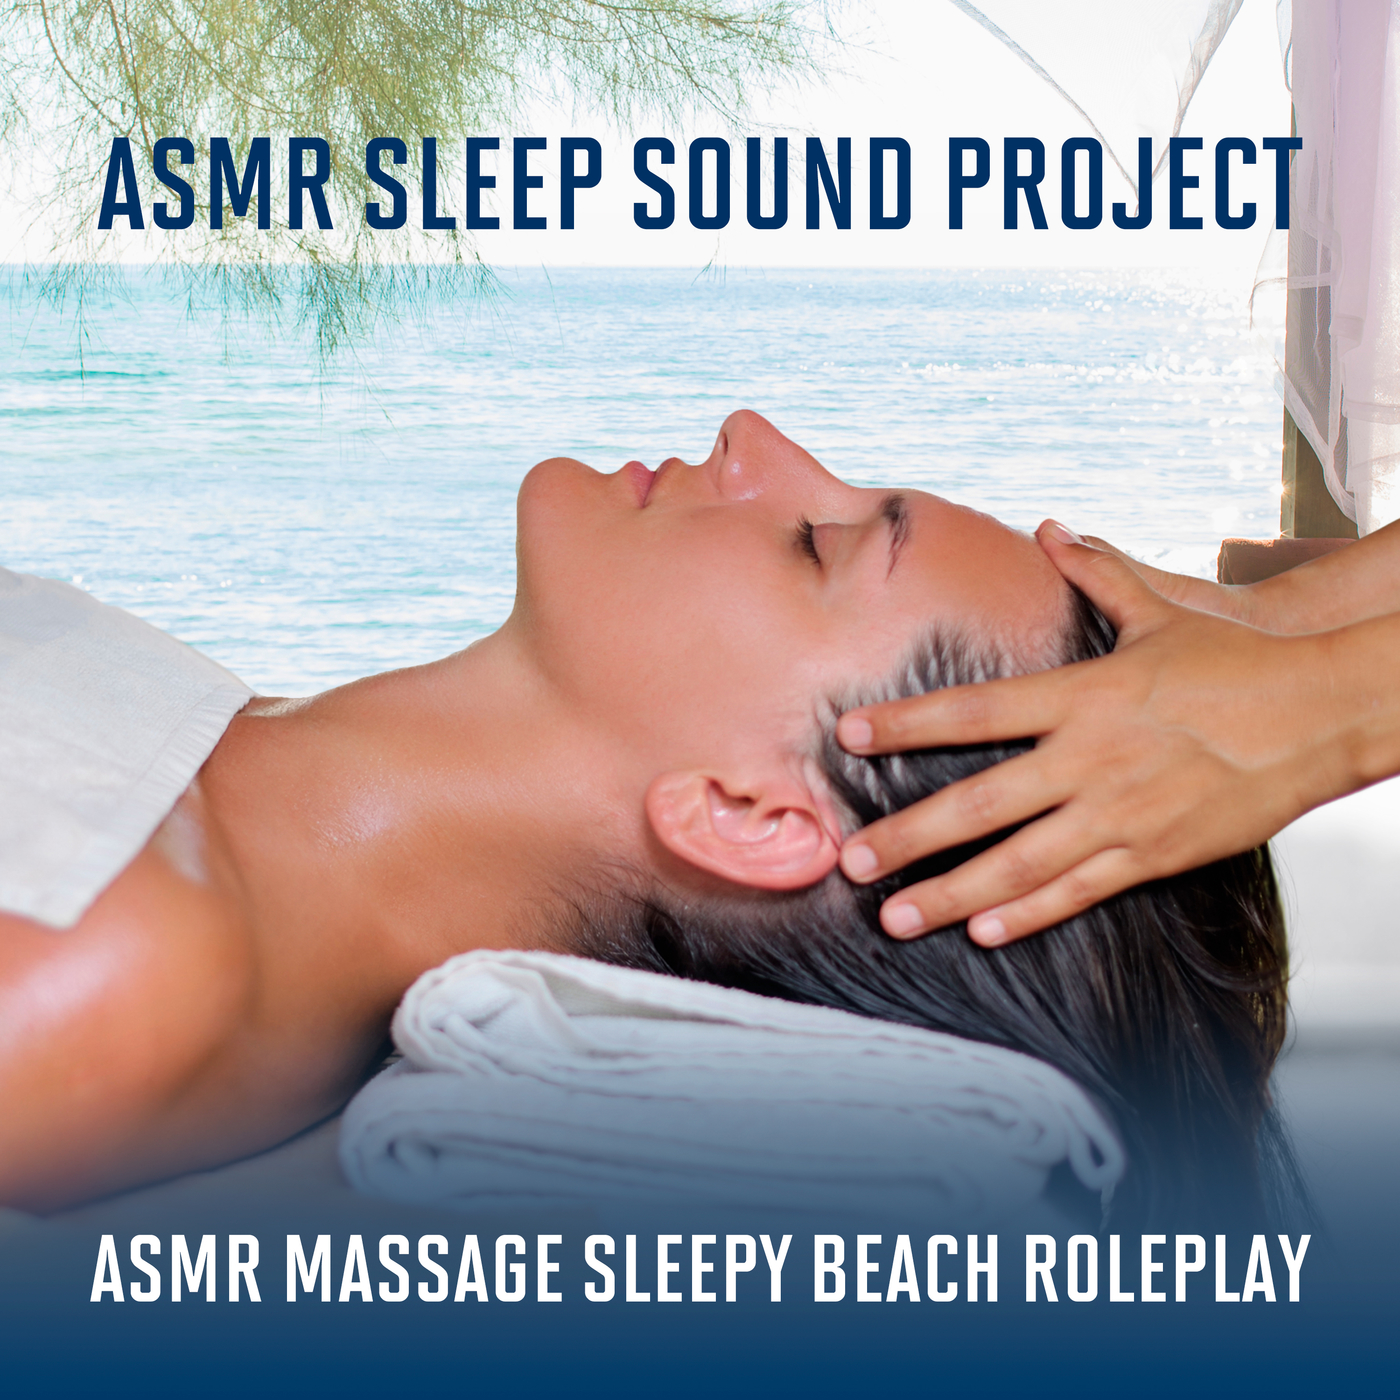 ASMR Massage - Sleepy Beach Roleplay - ASMR Sleep Sound Project